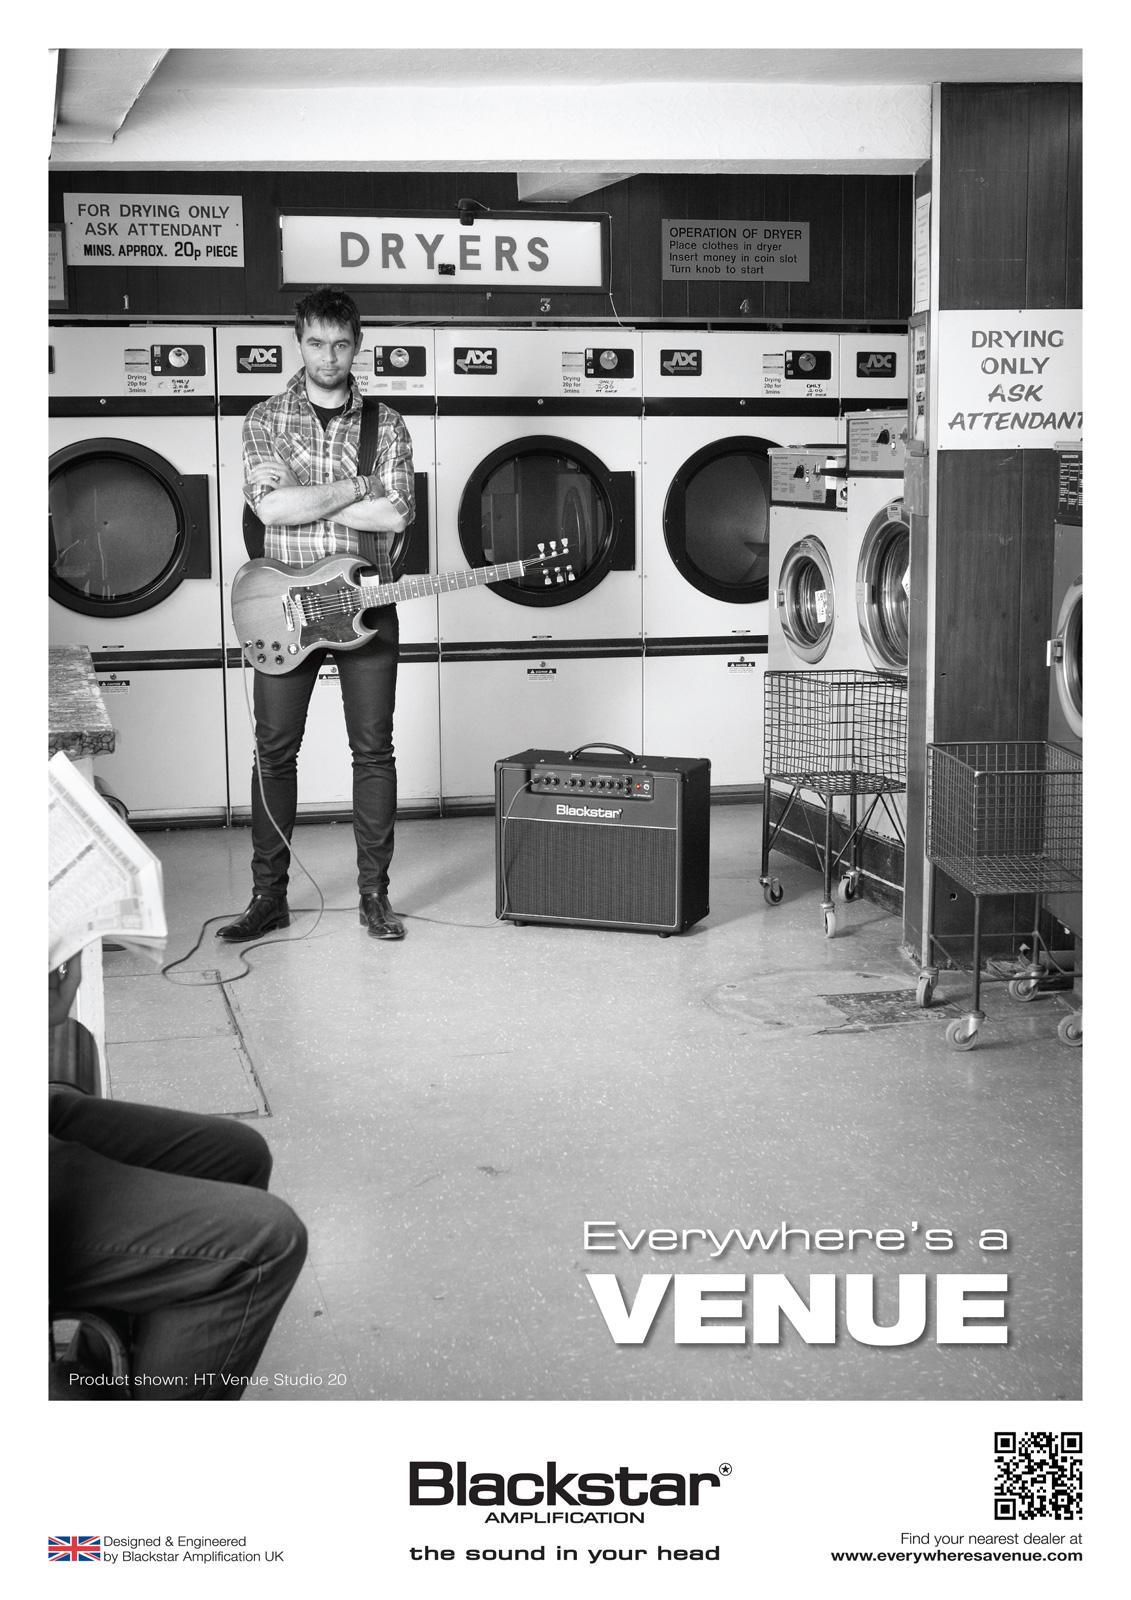 Blackstar Print Ad -  Everywhere's a Venue, Laundrette